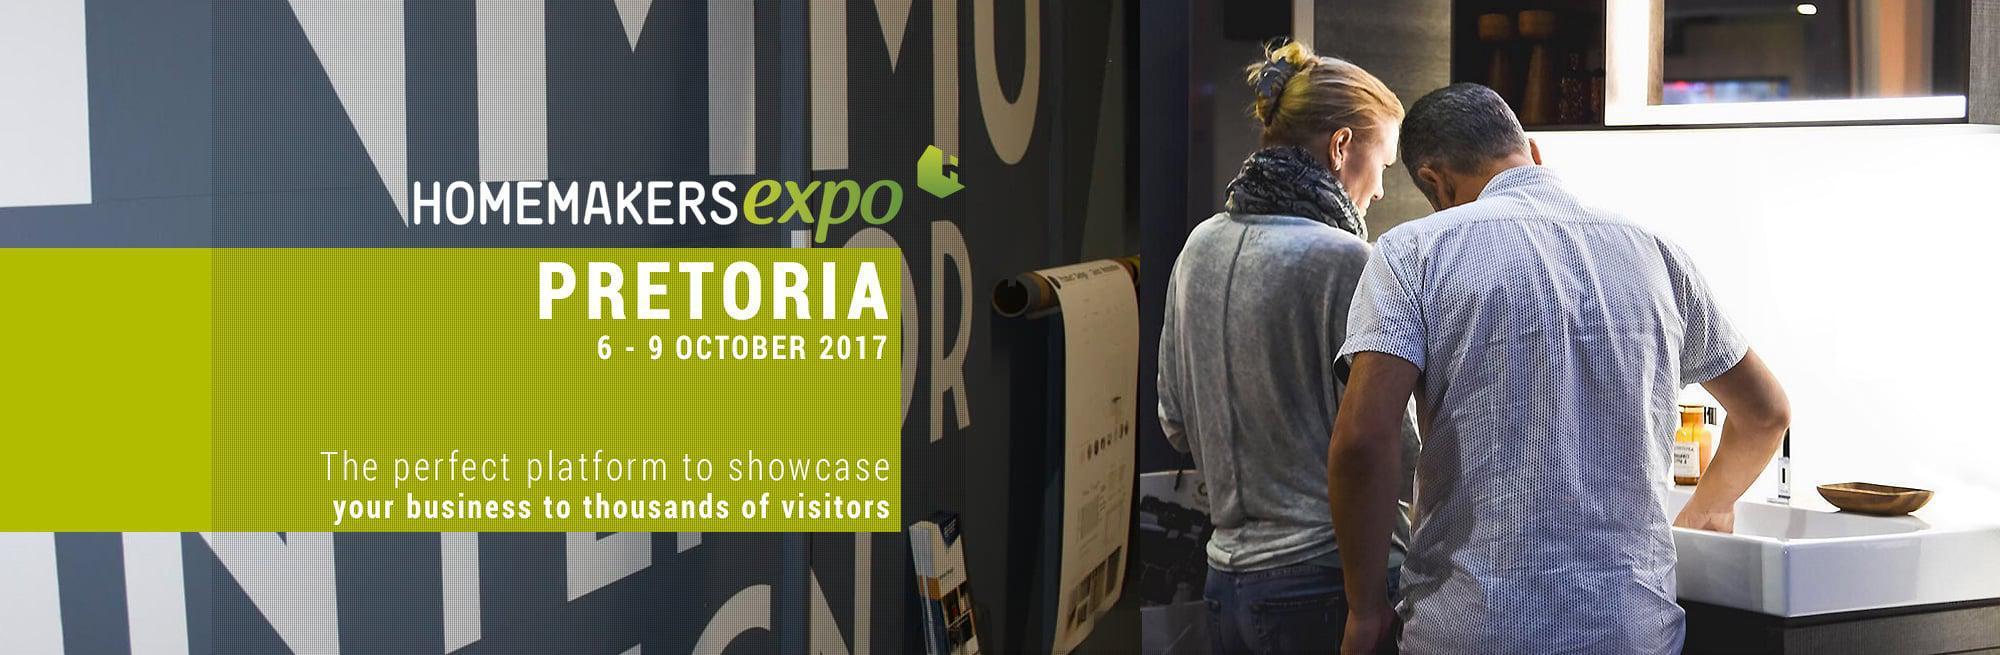 2017 Pretoria Homemakers Expo Homemakers Expo